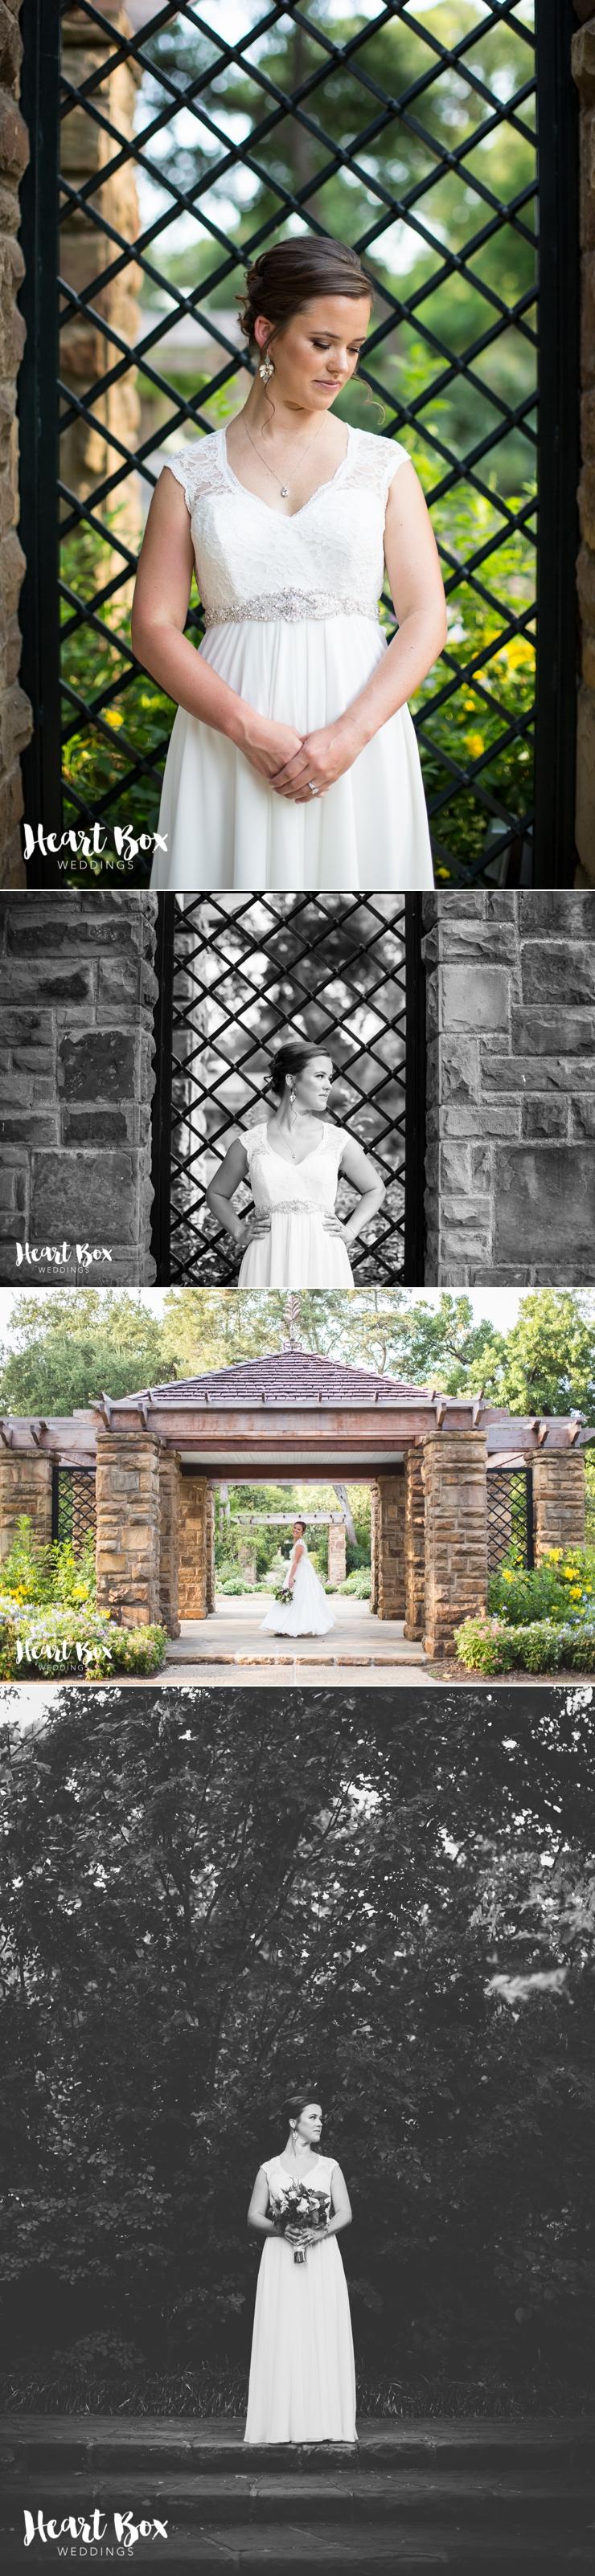 Hailey Bridal Blog Collages 4.jpg